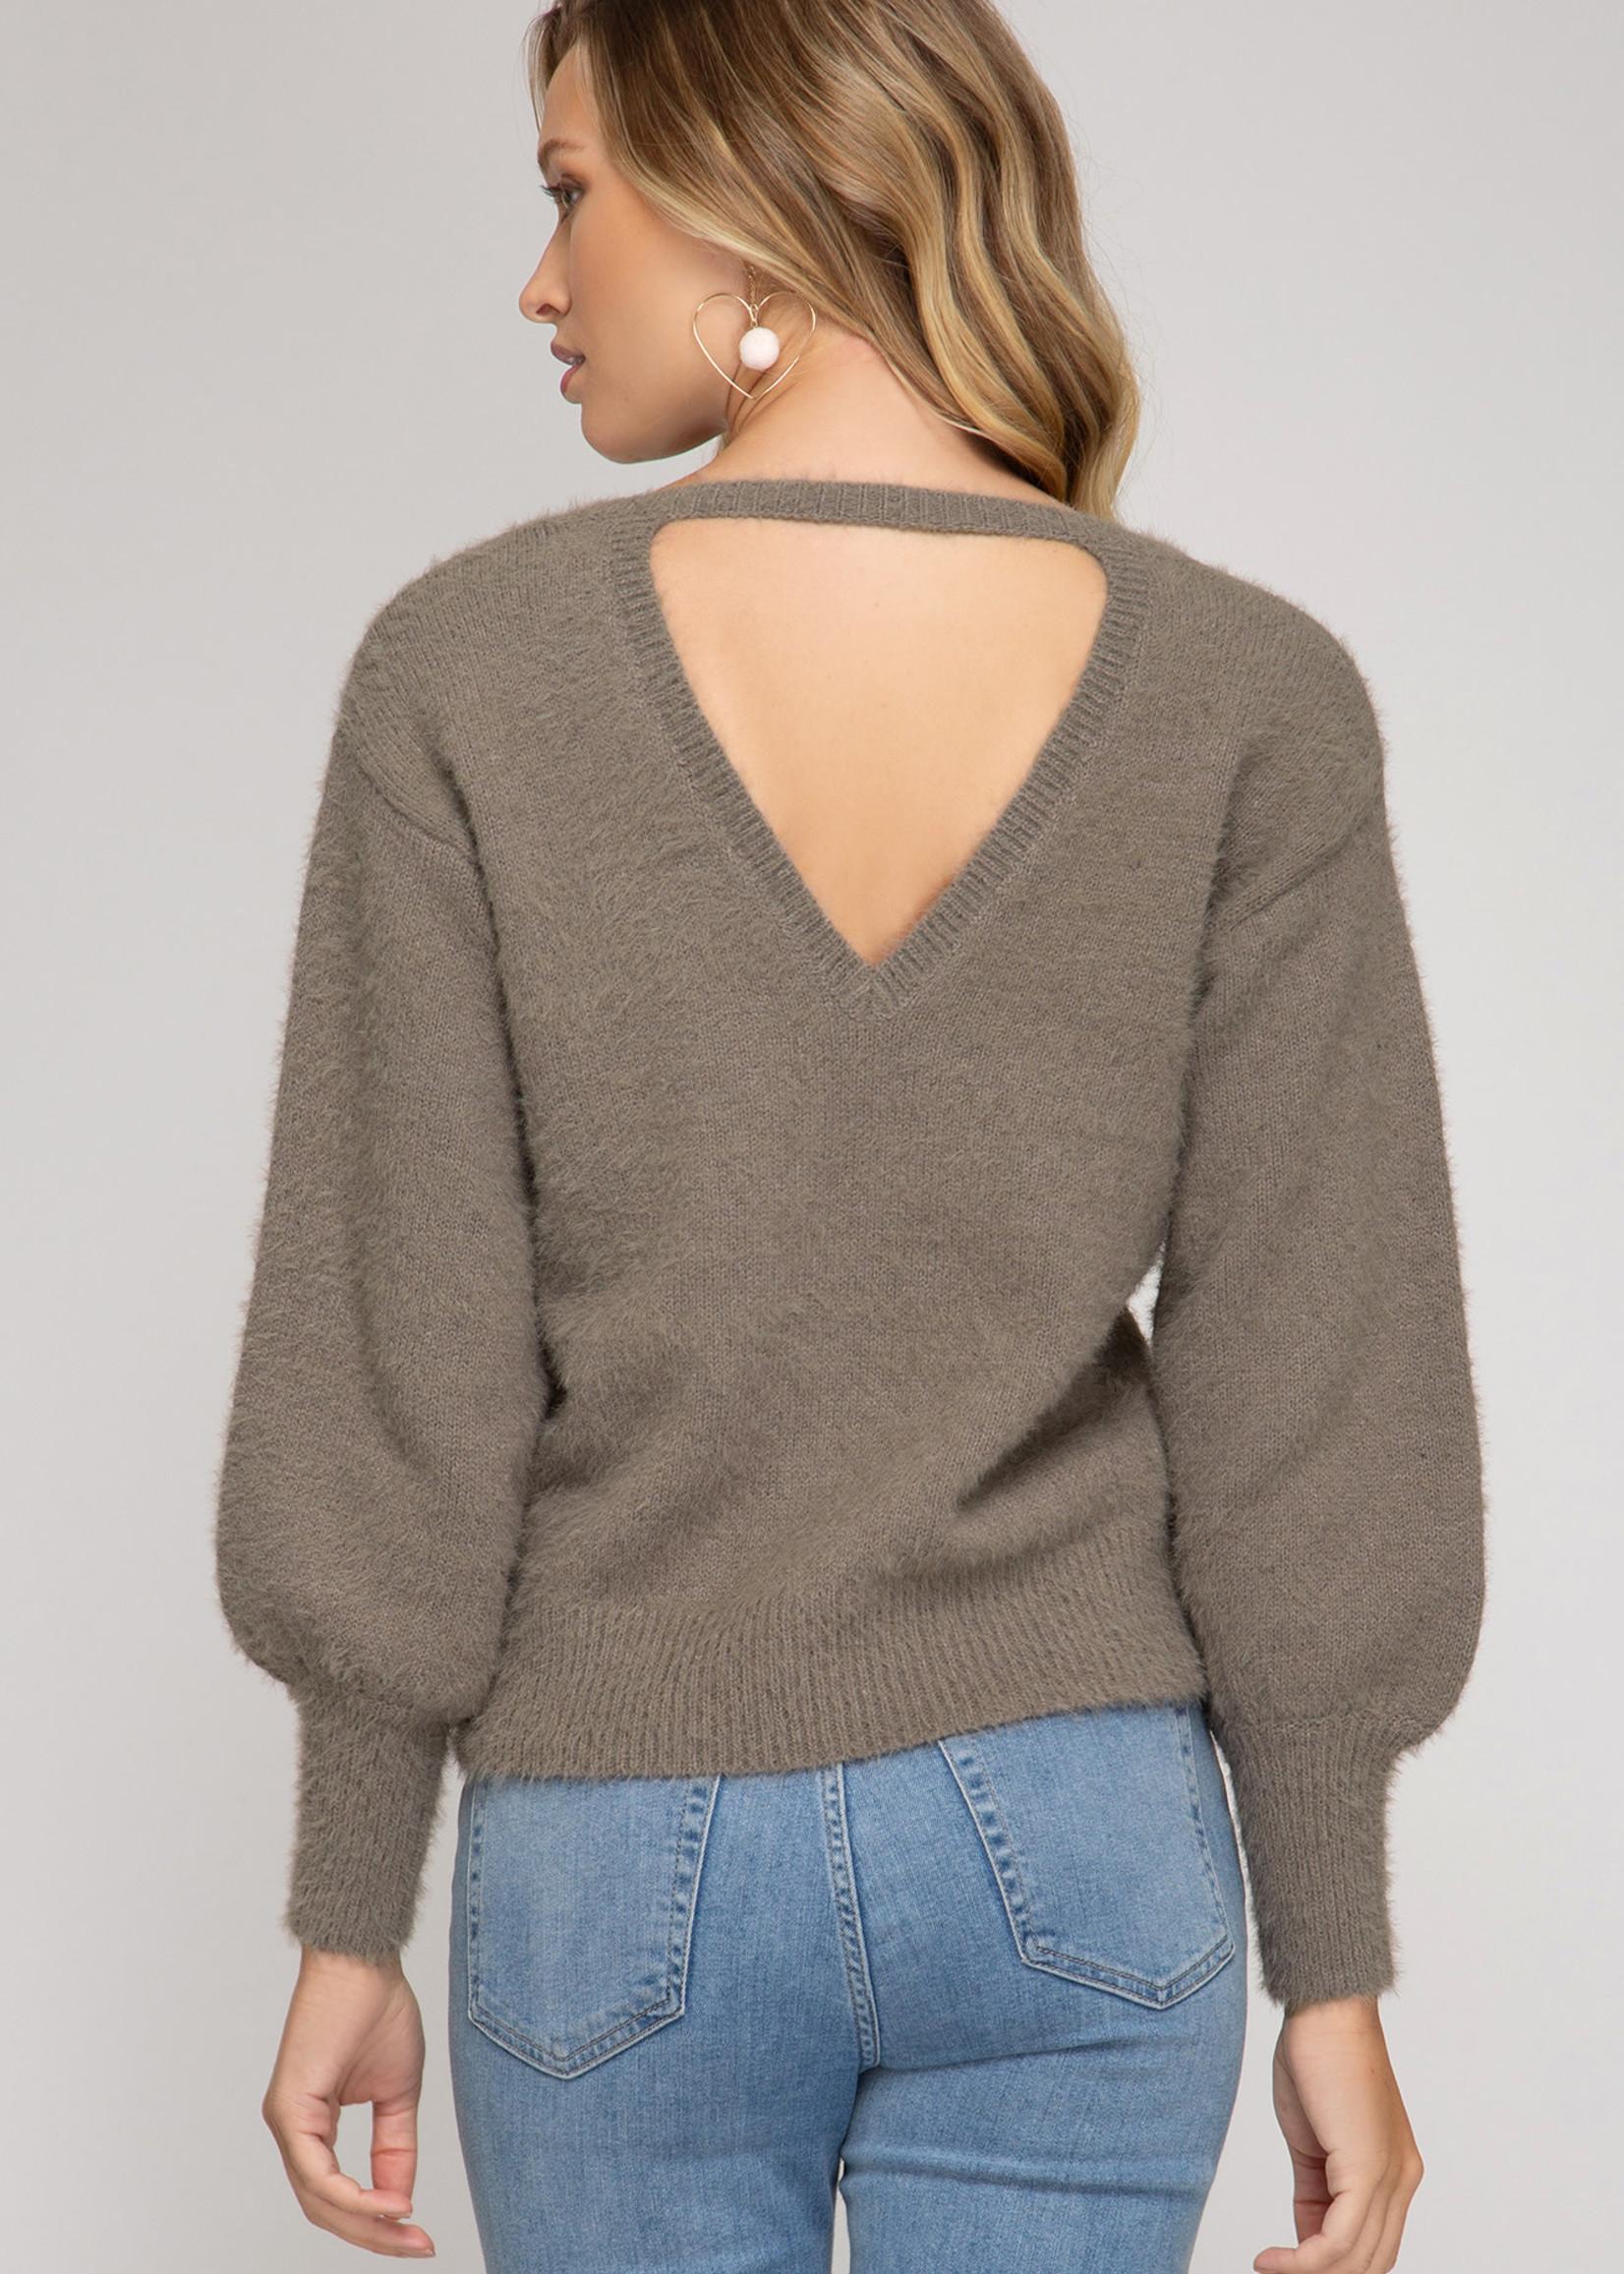 LeBLANC finds ZOE Cutout Sweater